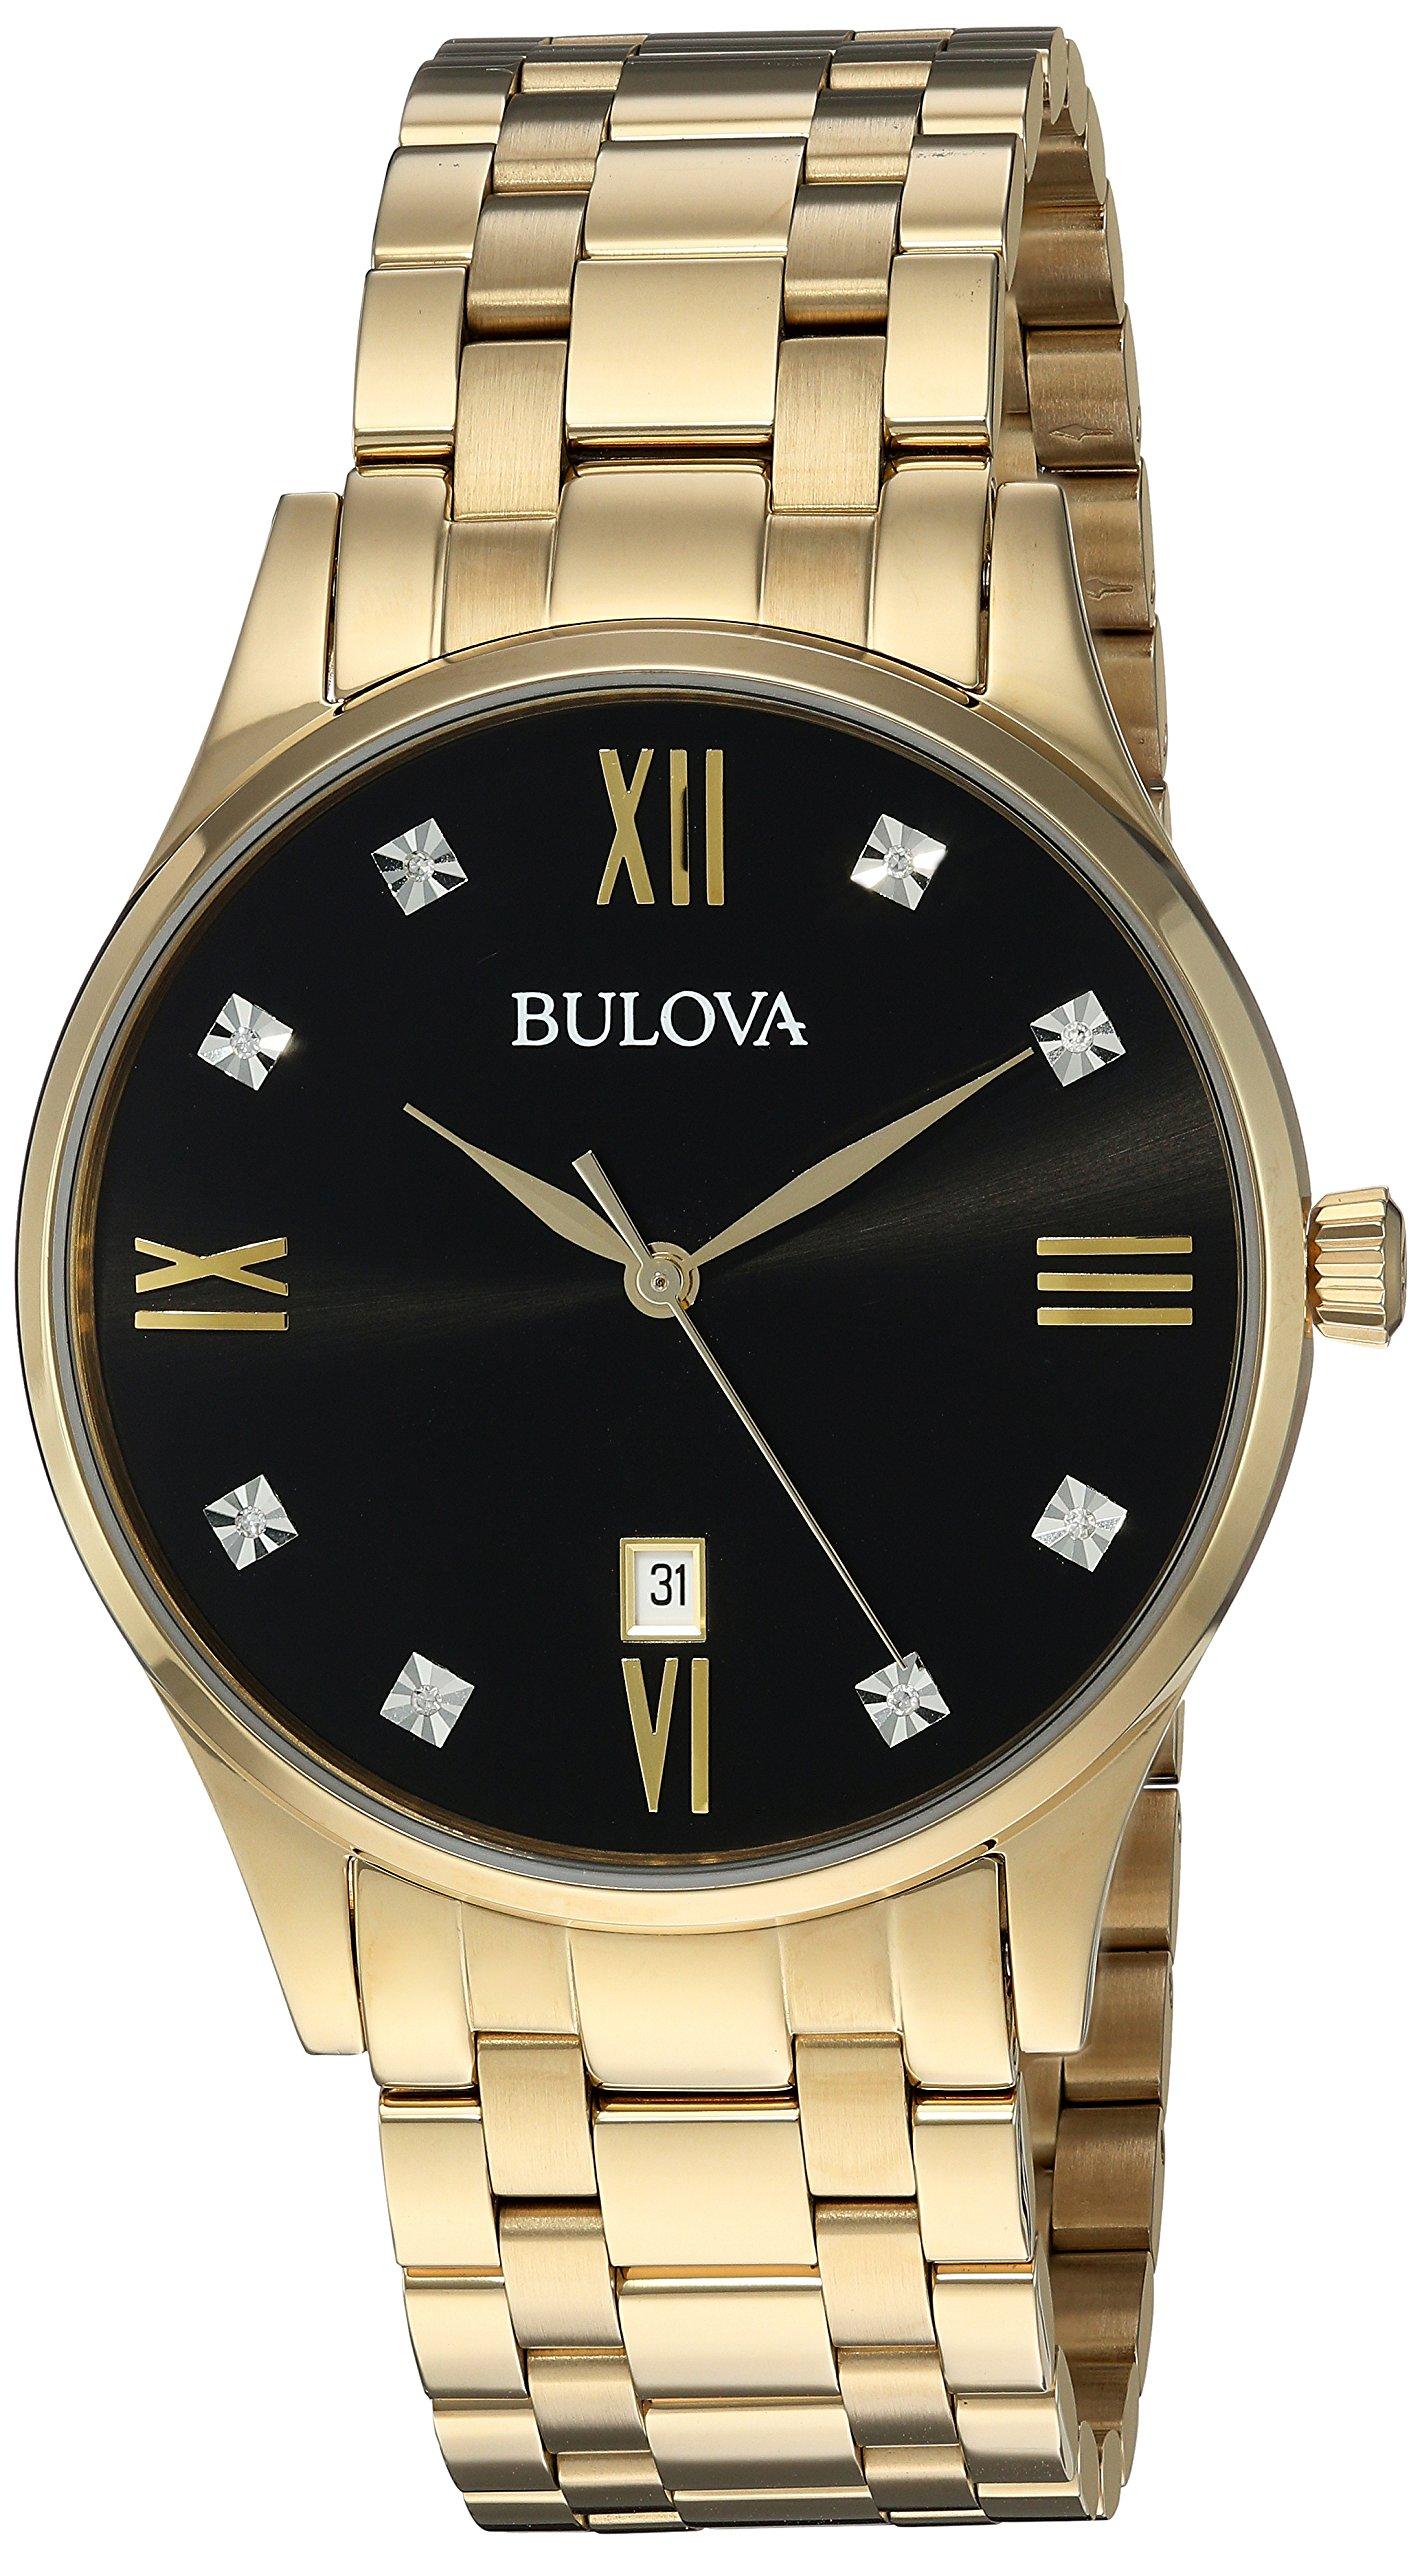 Bulova Men's Quartz Stainless Steel Dress Watch, Color:Gold-Toned (Model: 97D108) by Bulova